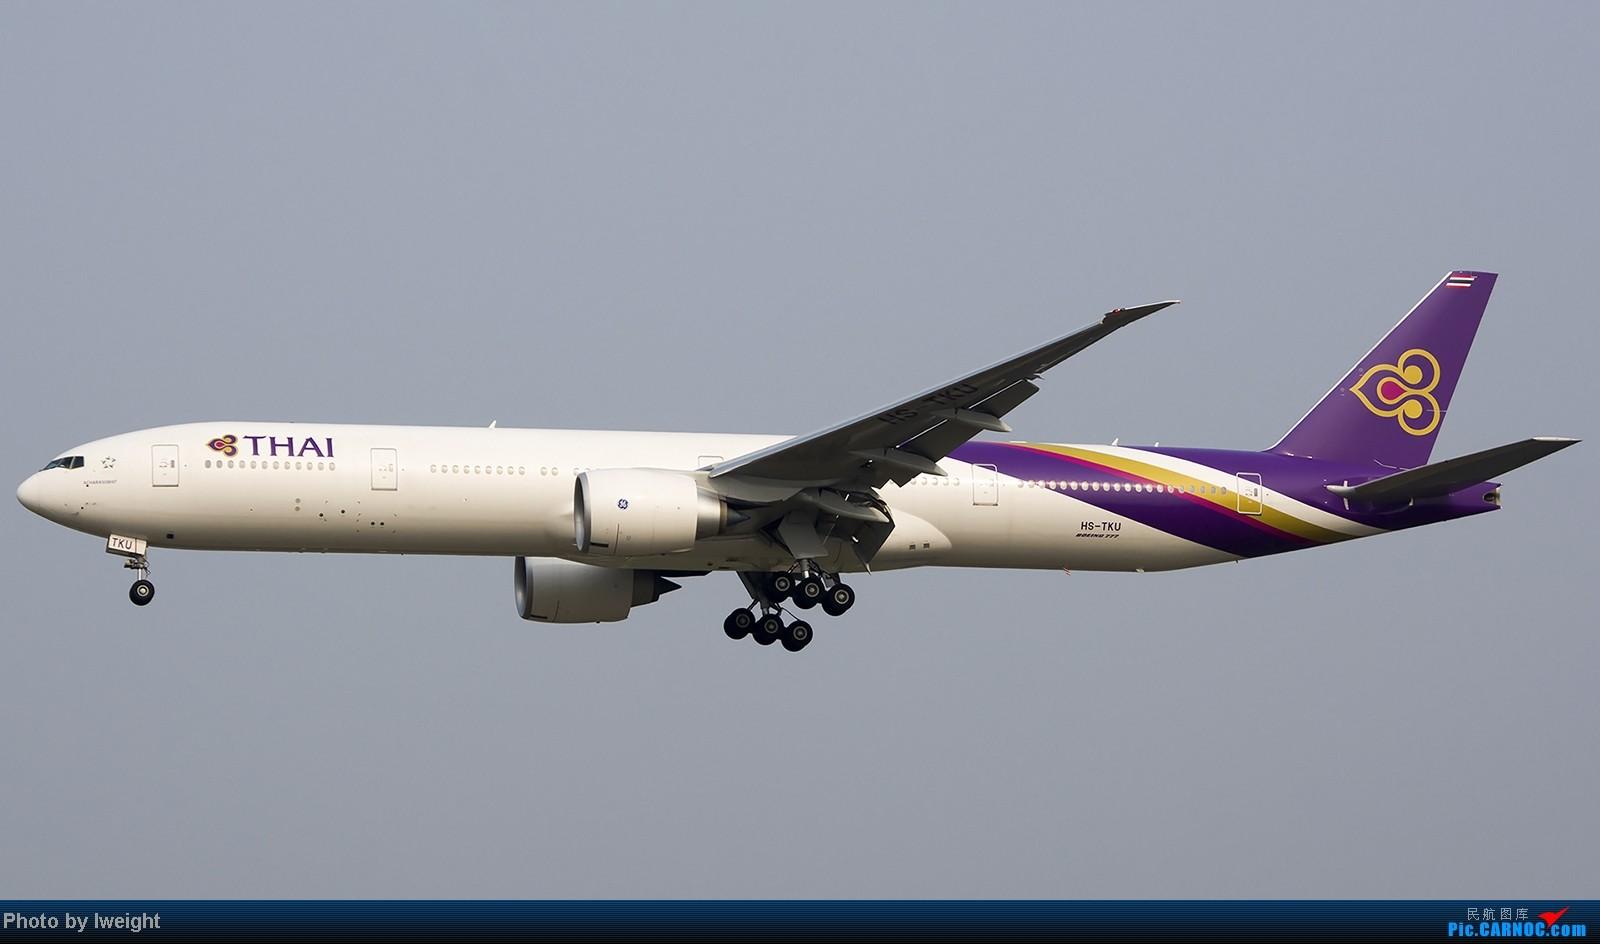 Re:[原创]9月7日帝都的烂天里乱拍一通 BOEING 777-300ER HS-TKU 中国北京首都机场